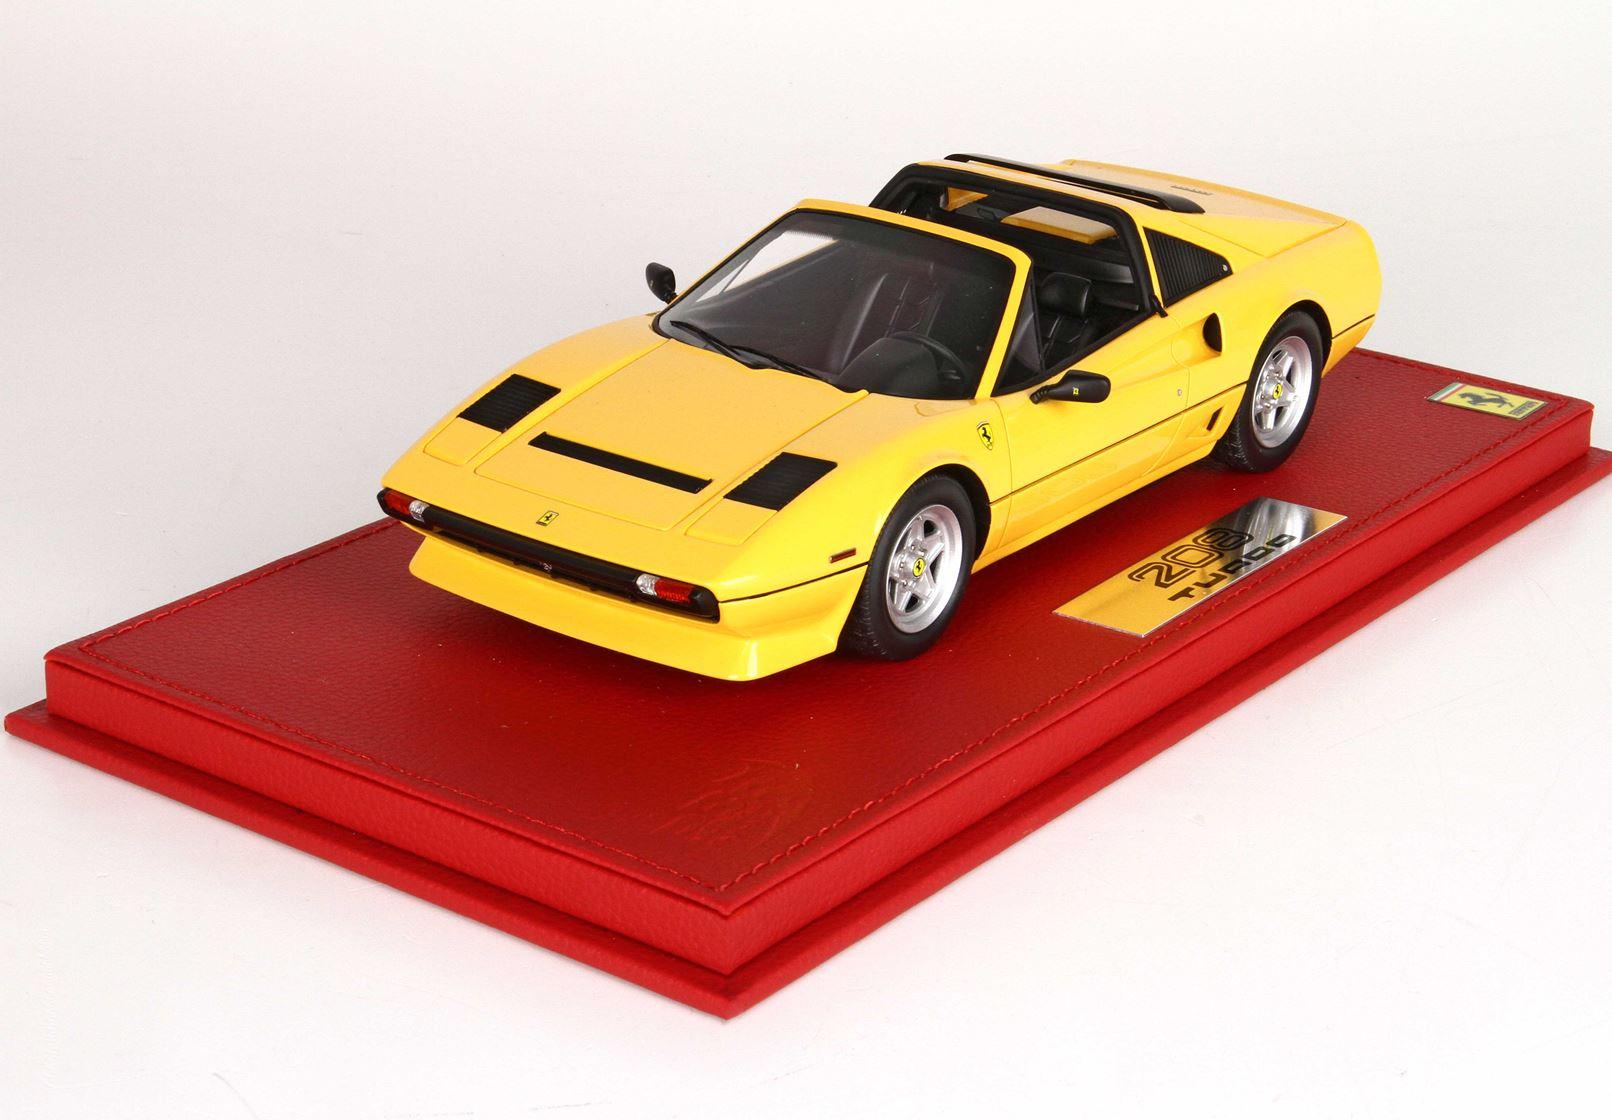 Ferrari 208 Gts Turbo 1983 Giallo Modena With Case Limited 99 Pieces 1/18